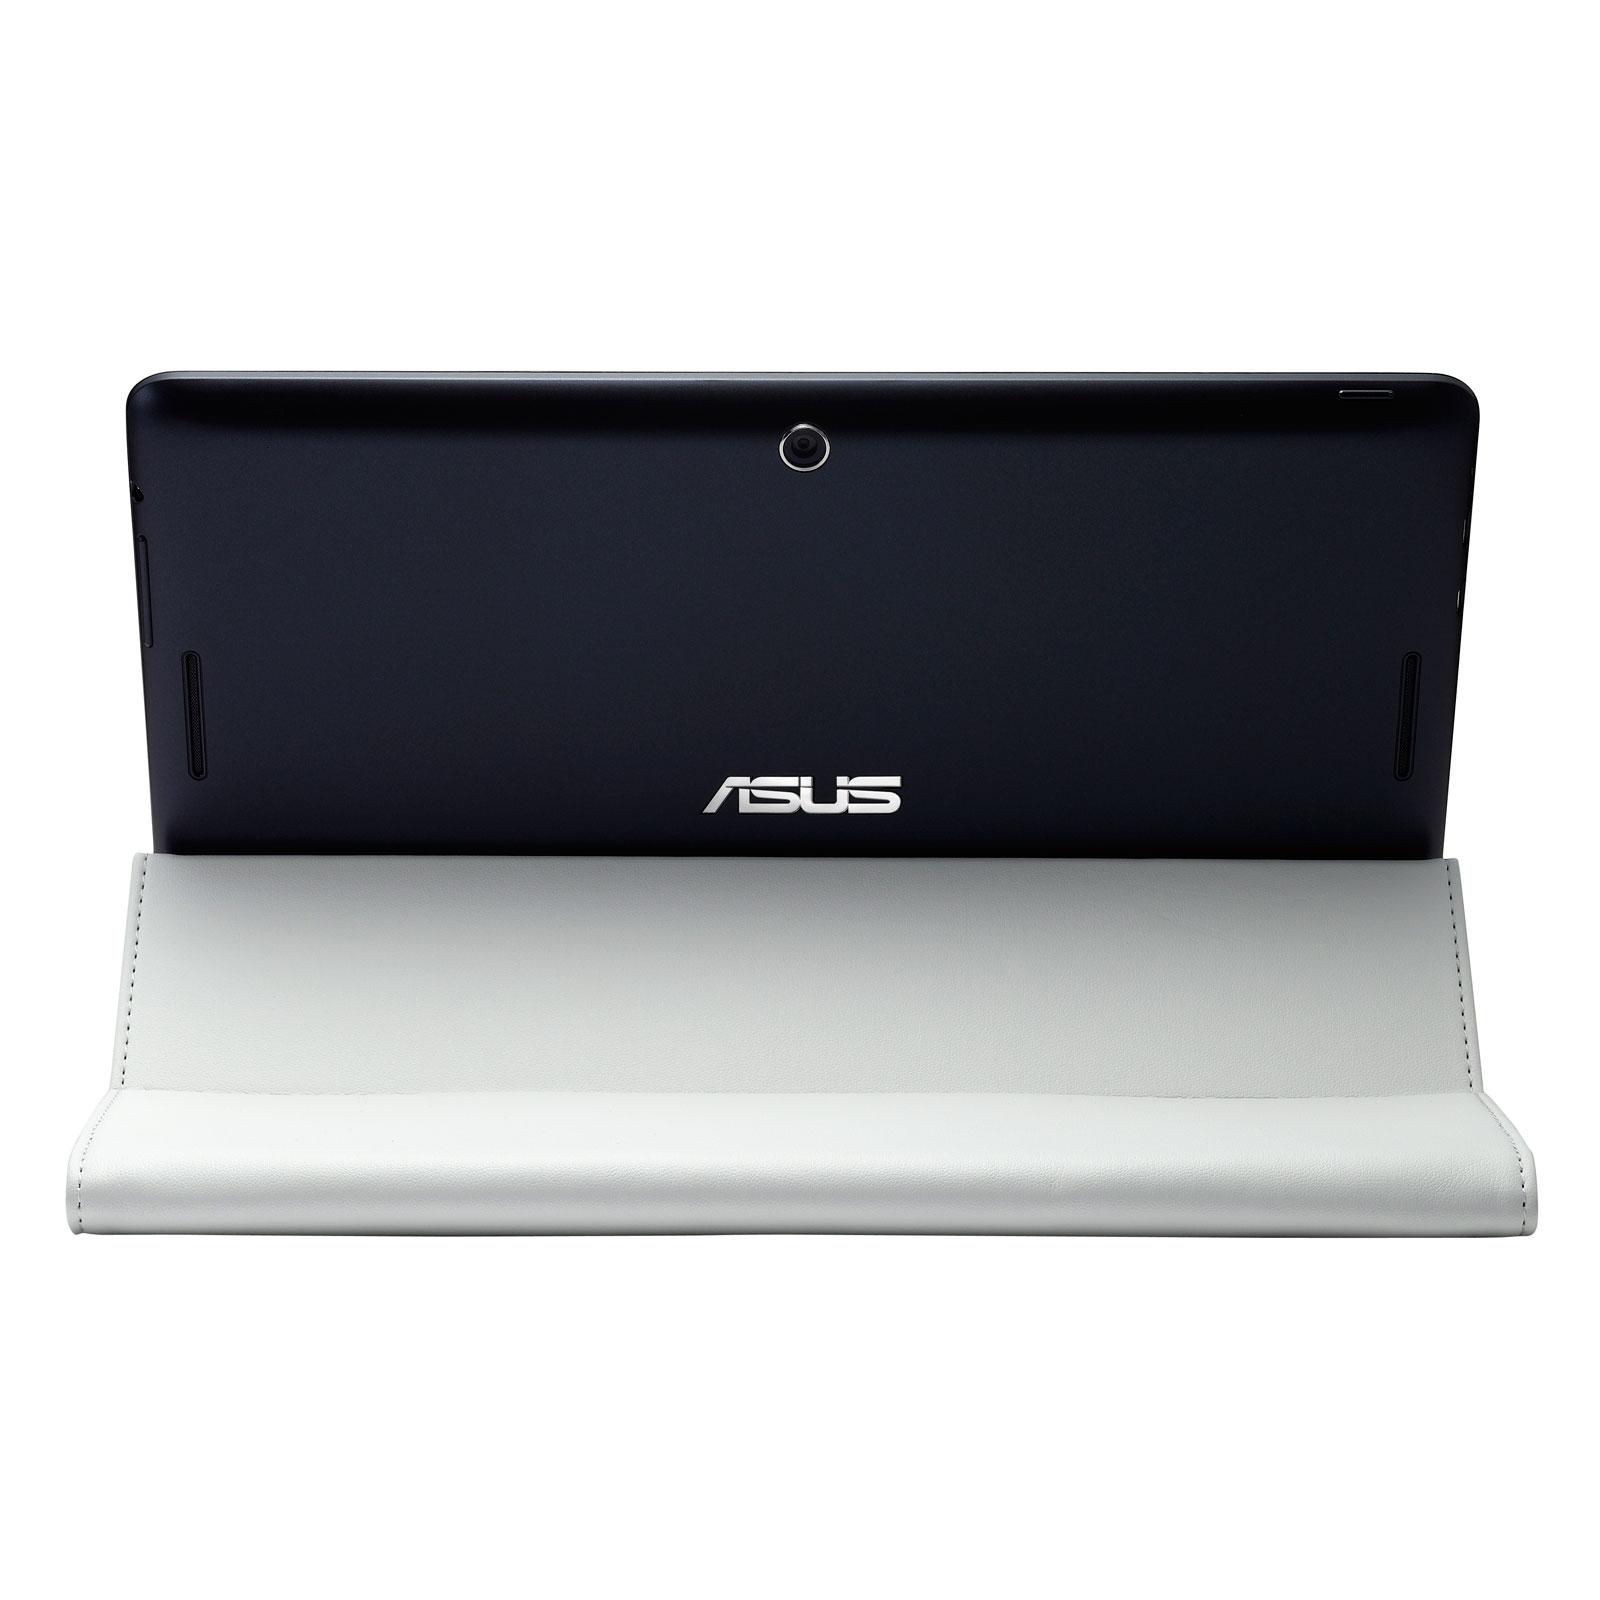 asus versasleeve x 10 blanc accessoires tablette asus. Black Bedroom Furniture Sets. Home Design Ideas